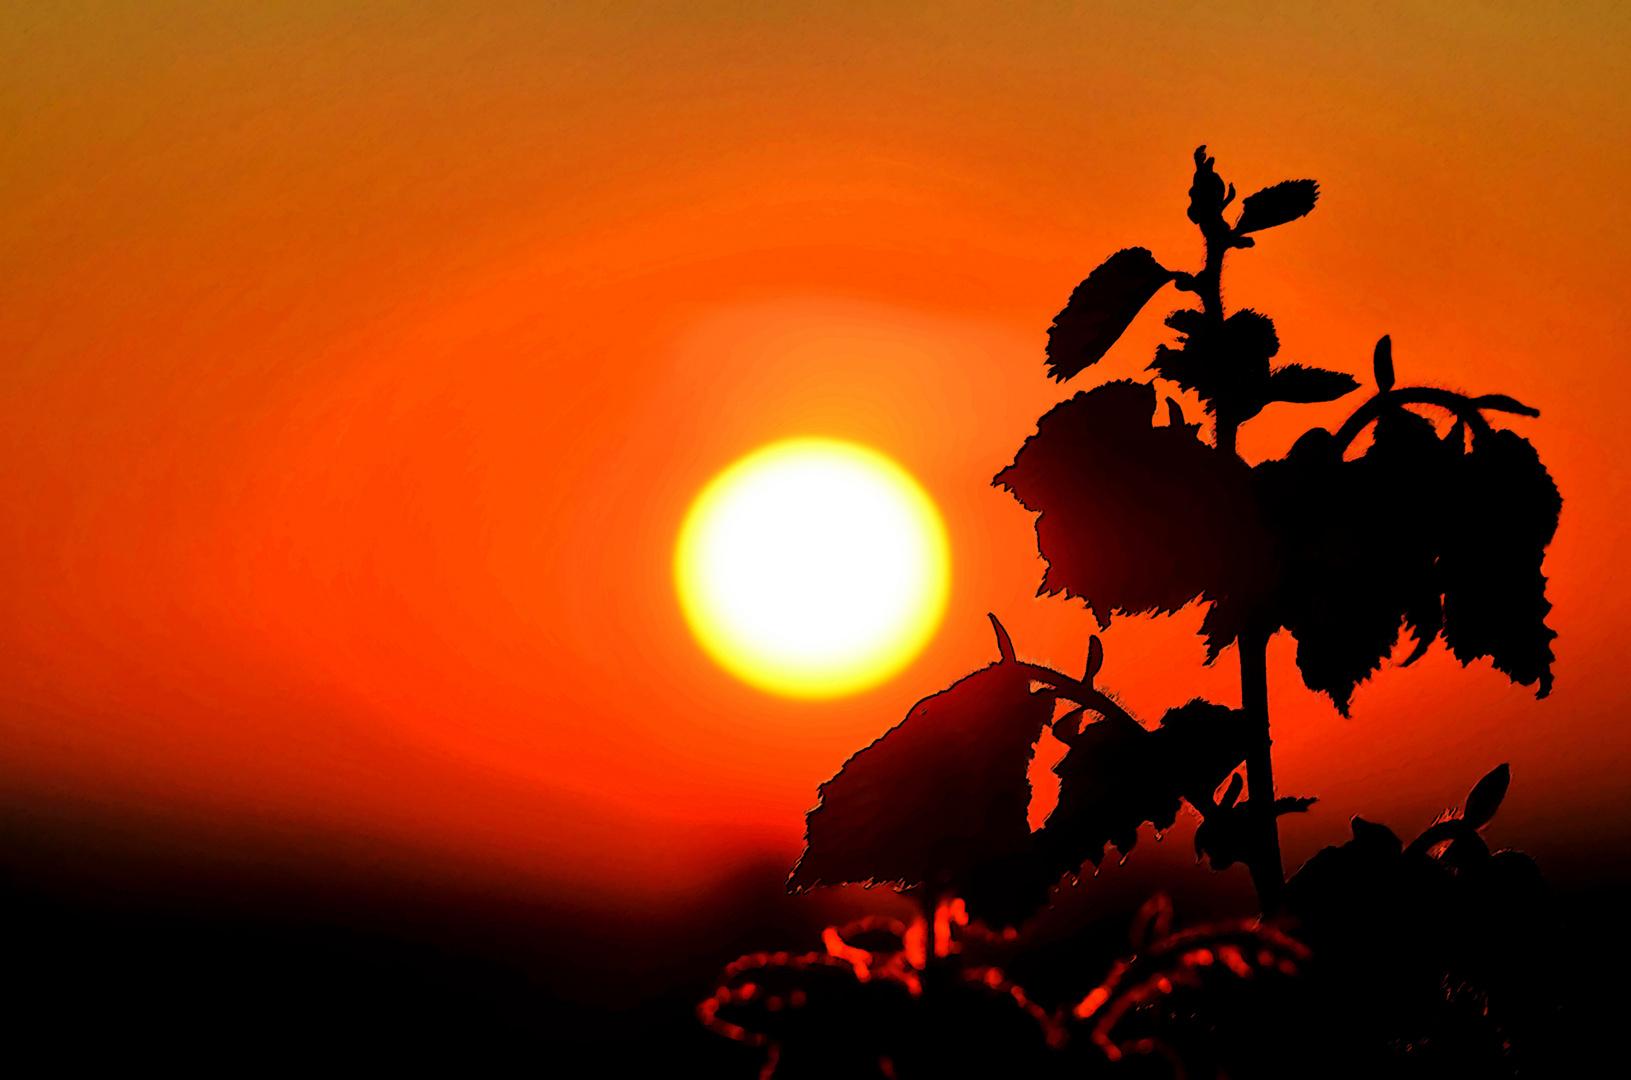 Abendsonne am Horizont